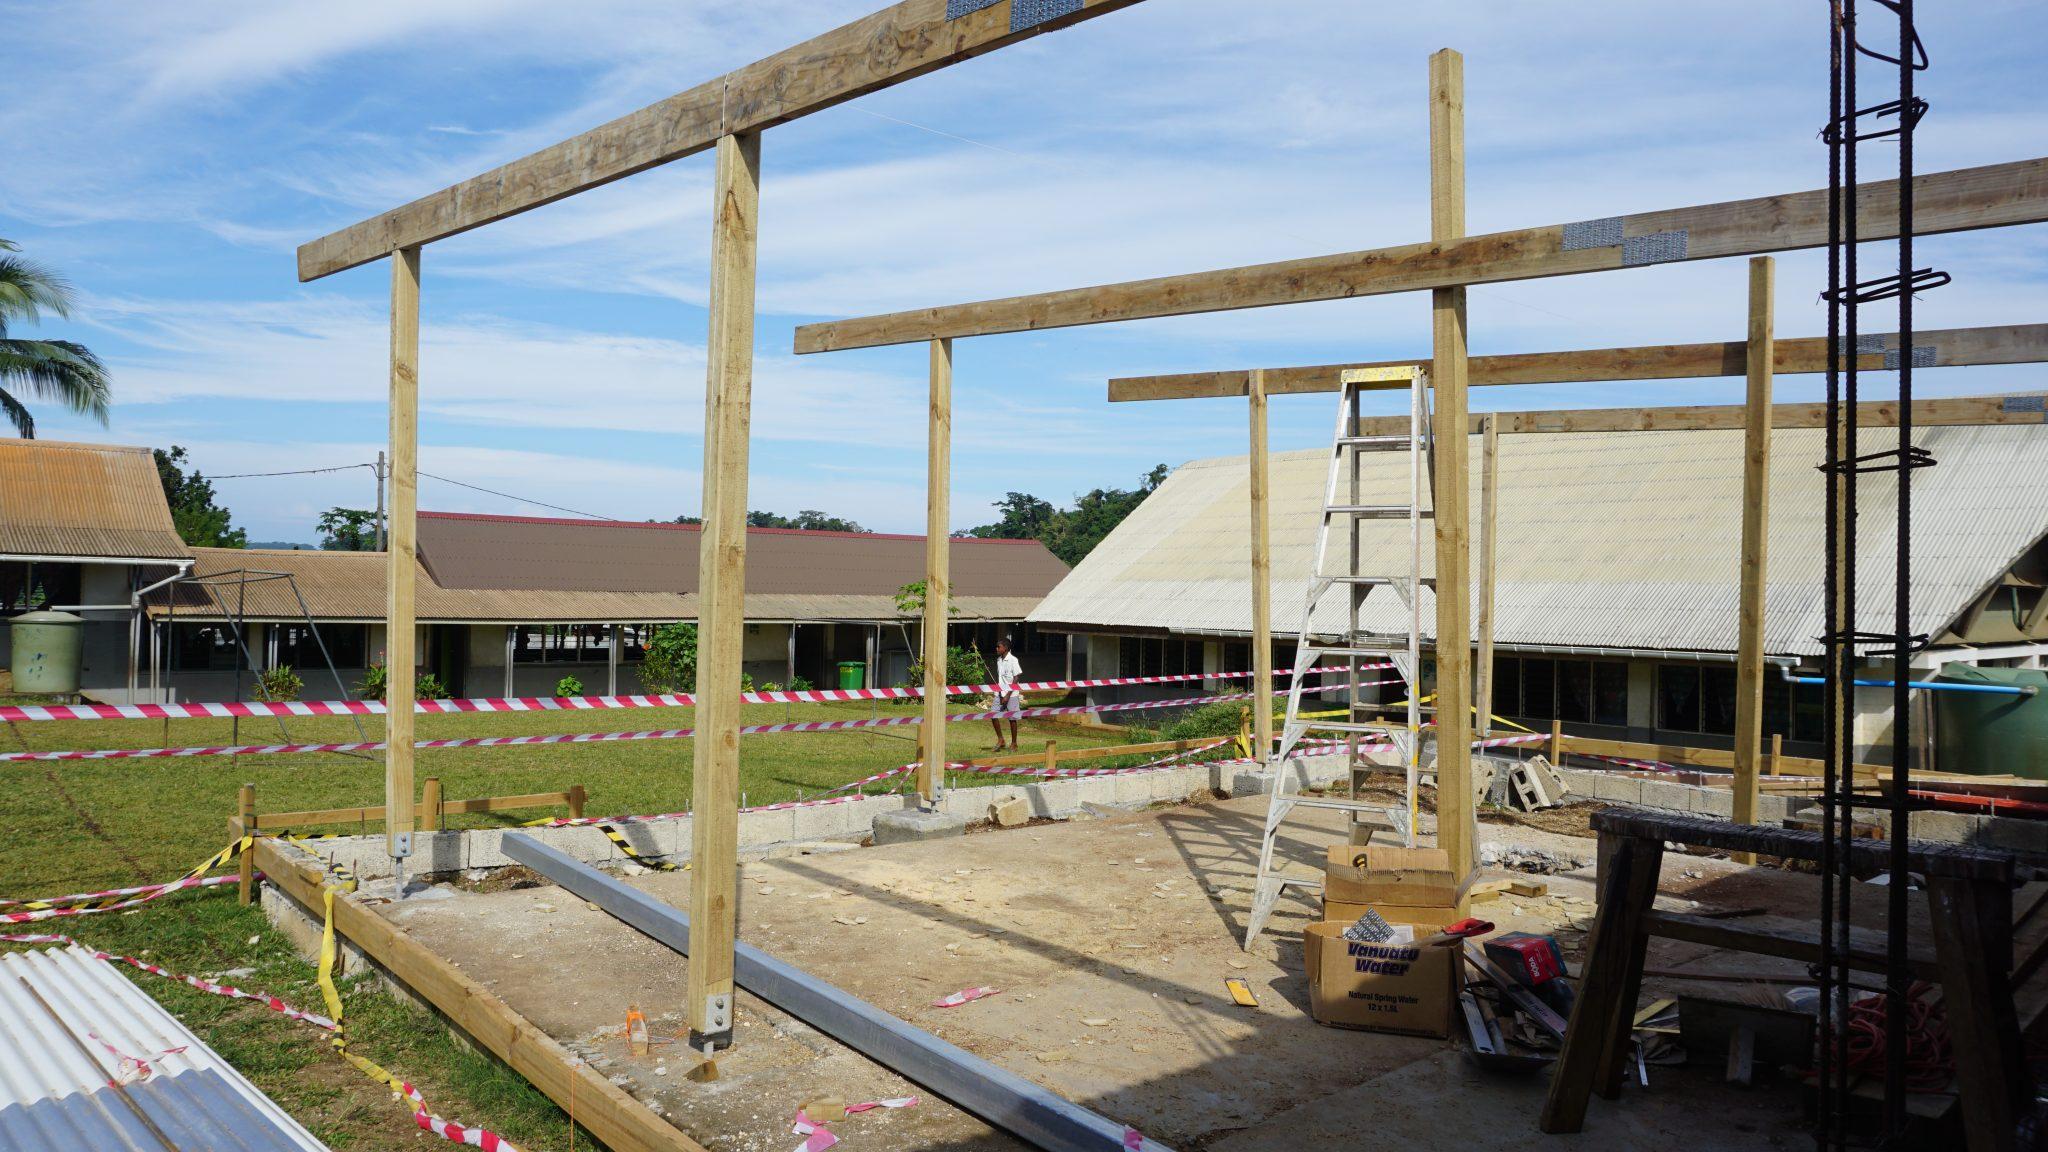 construction site where volunteers work